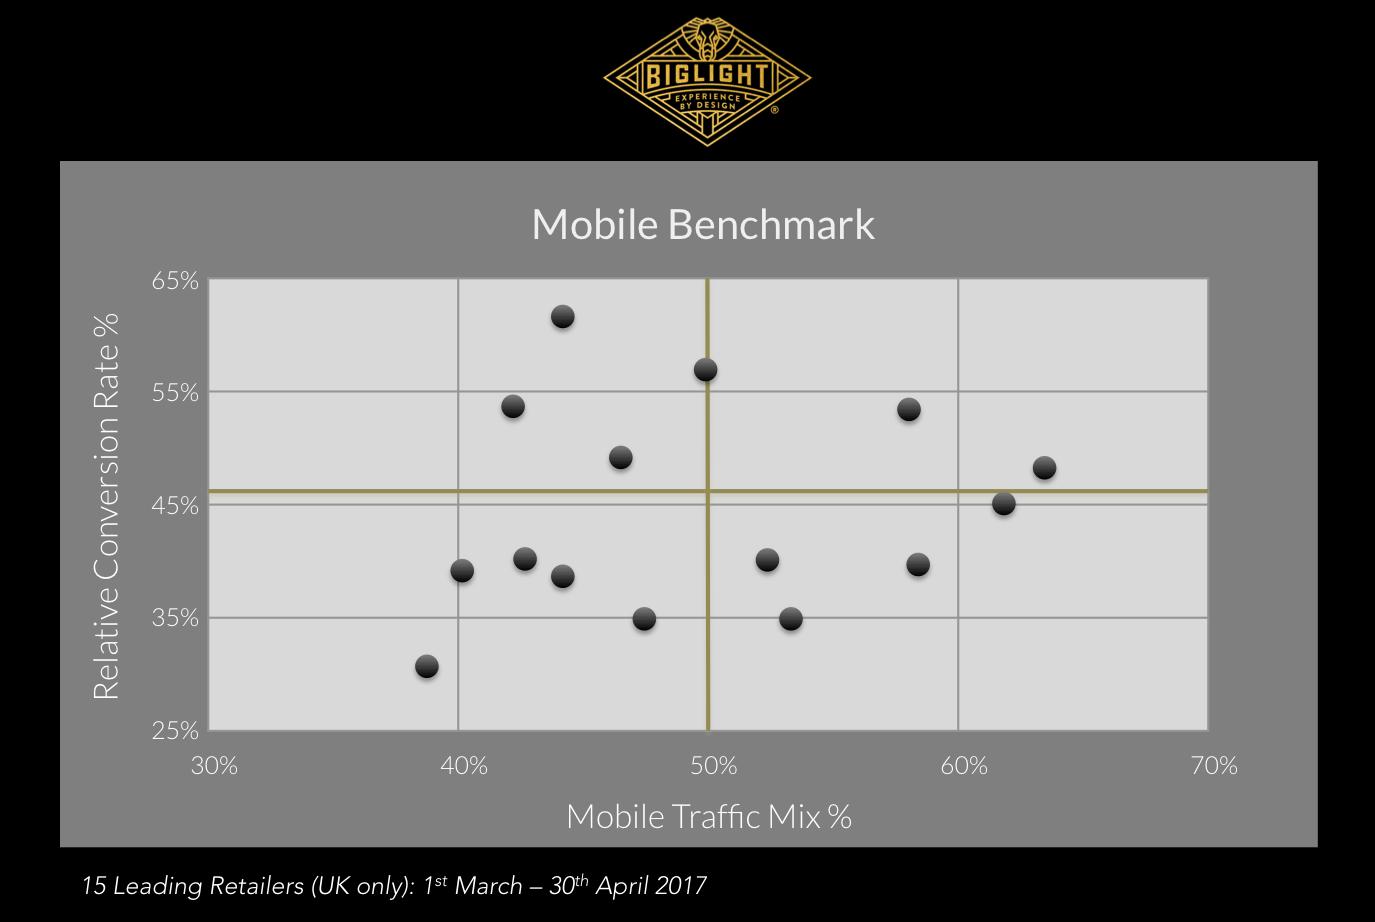 Mobile Benchmark